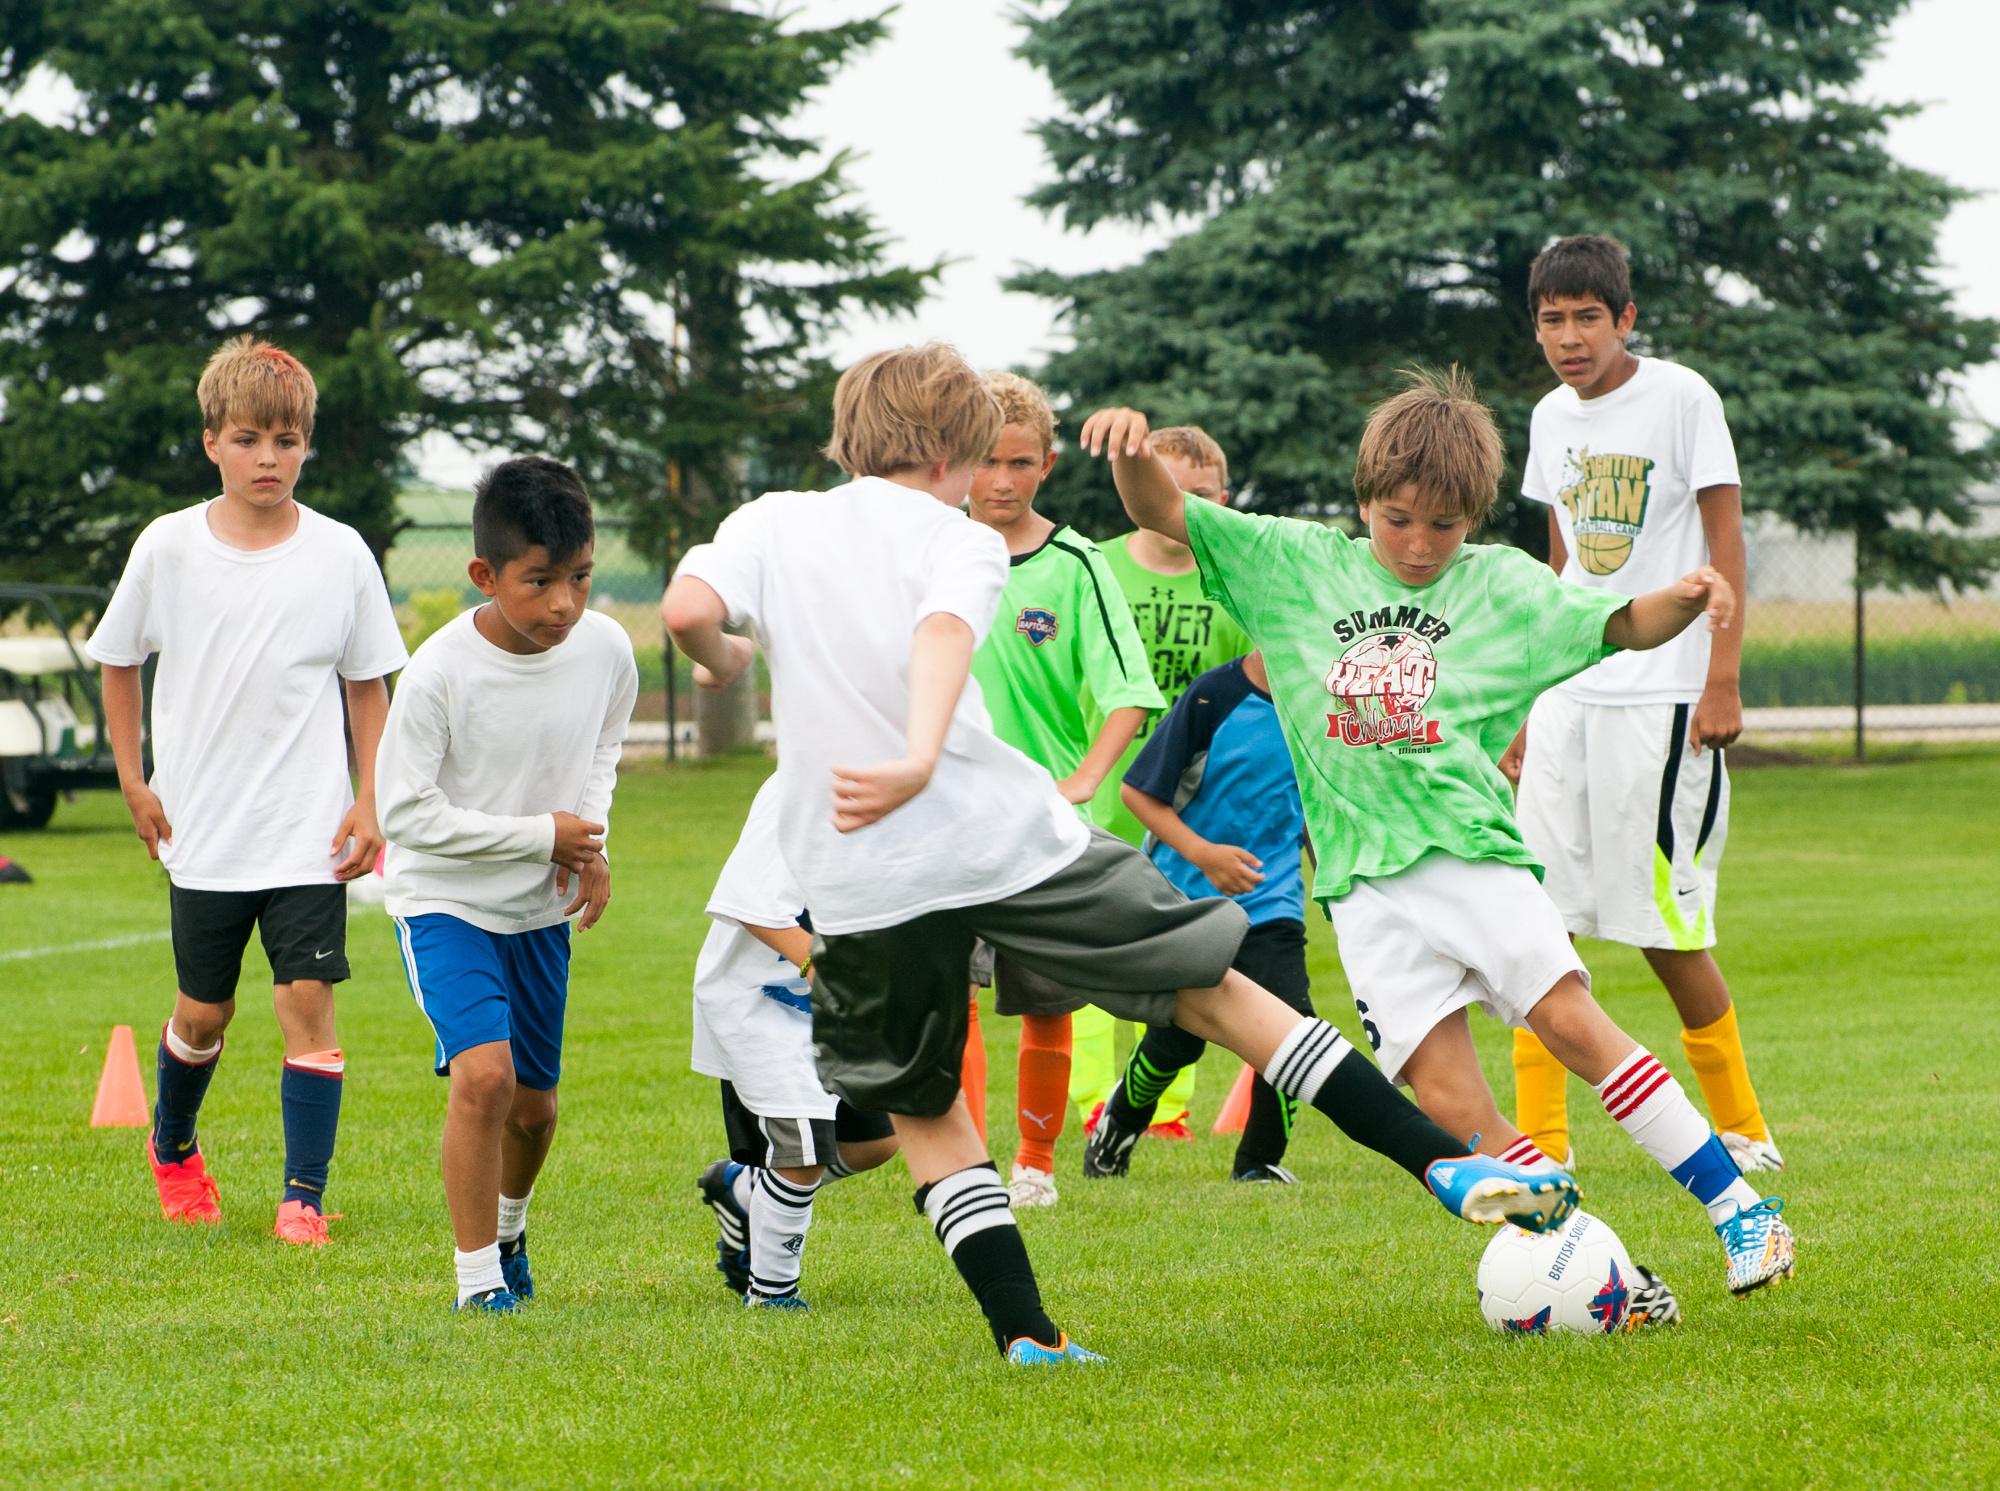 Challenger_British_Soccer_Camp-12.jpg